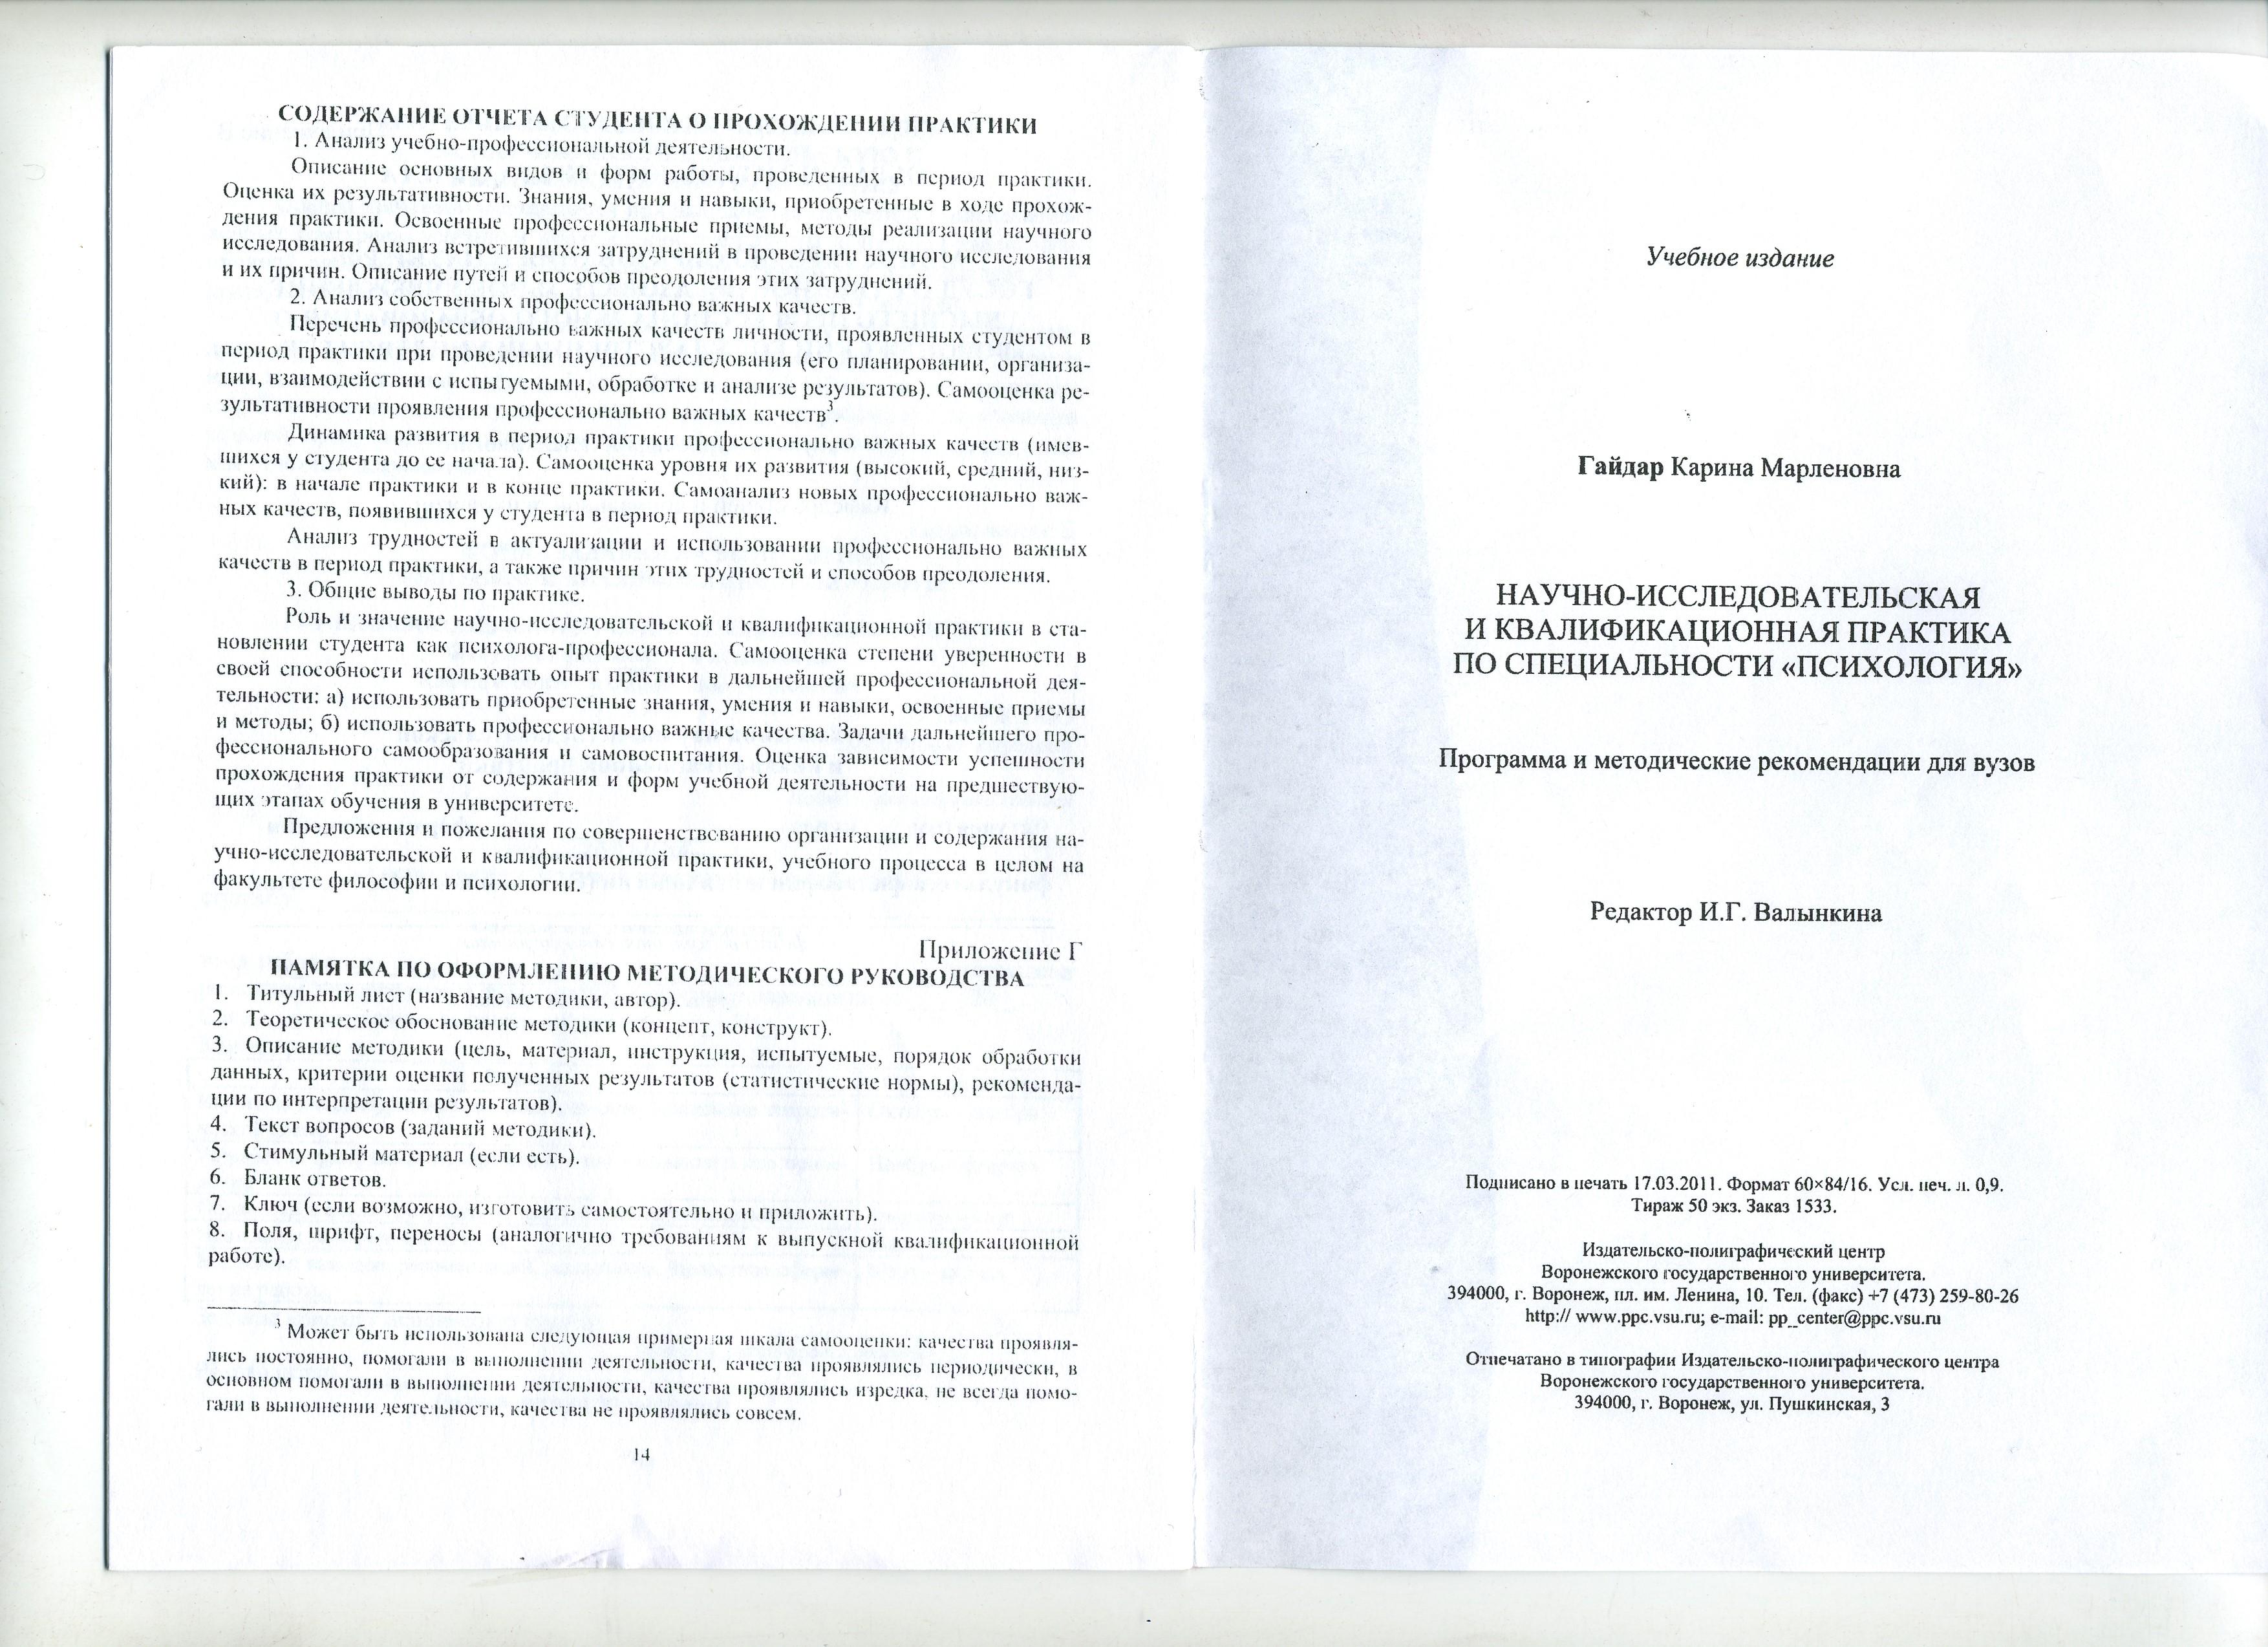 sitesito narod ru ФИПСИ Коллеги Шаблон оформления диссертации